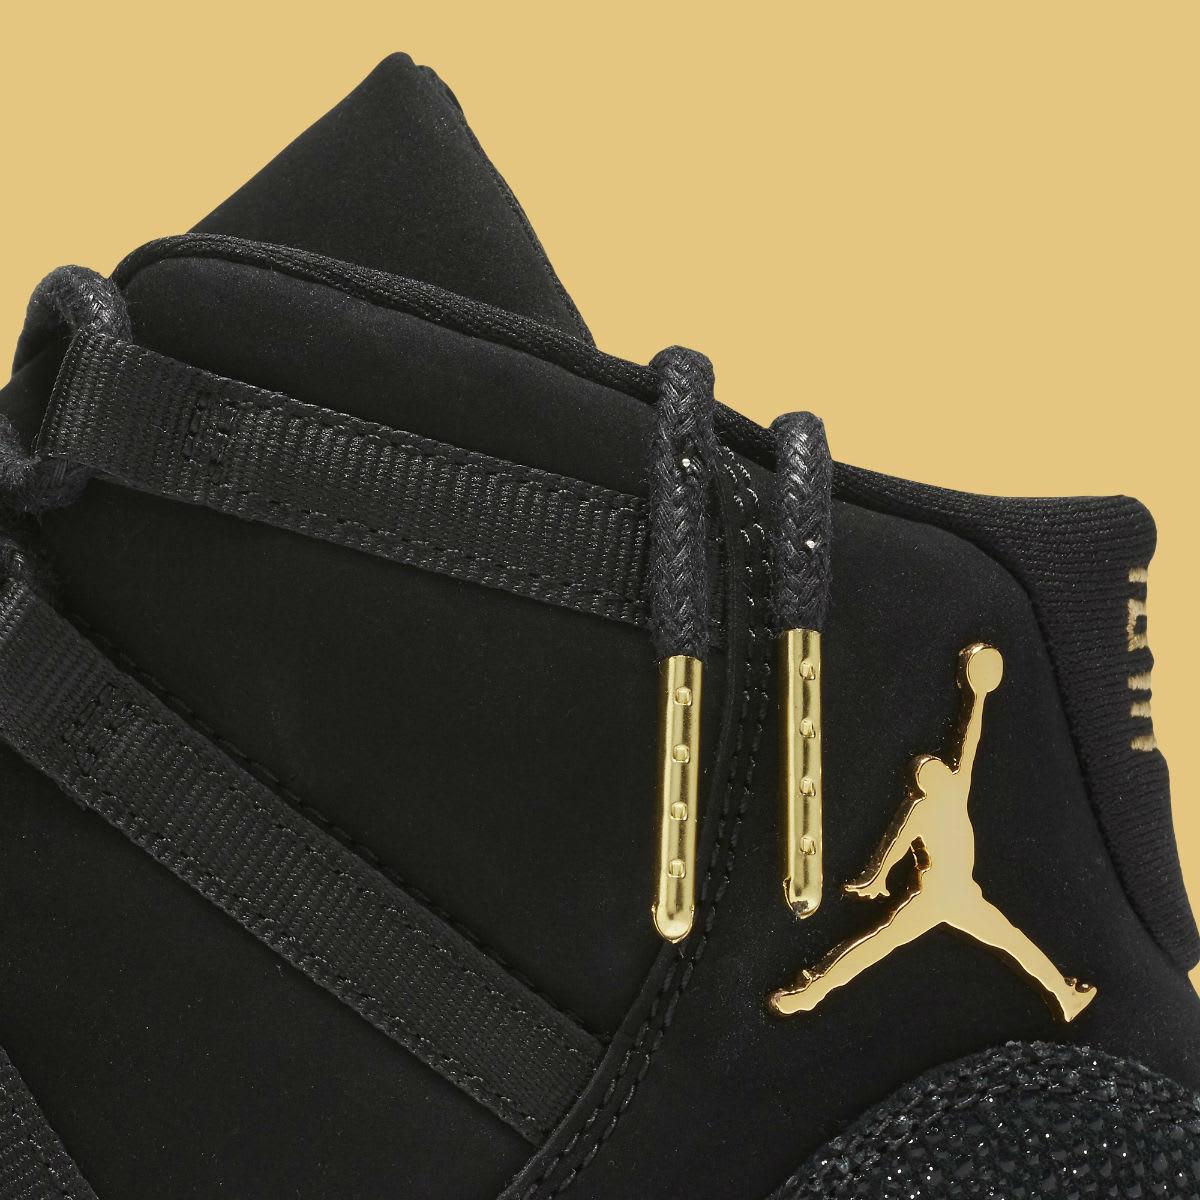 Air Jordan 11 XI Heiress Black Release Date 852625-030 Laces